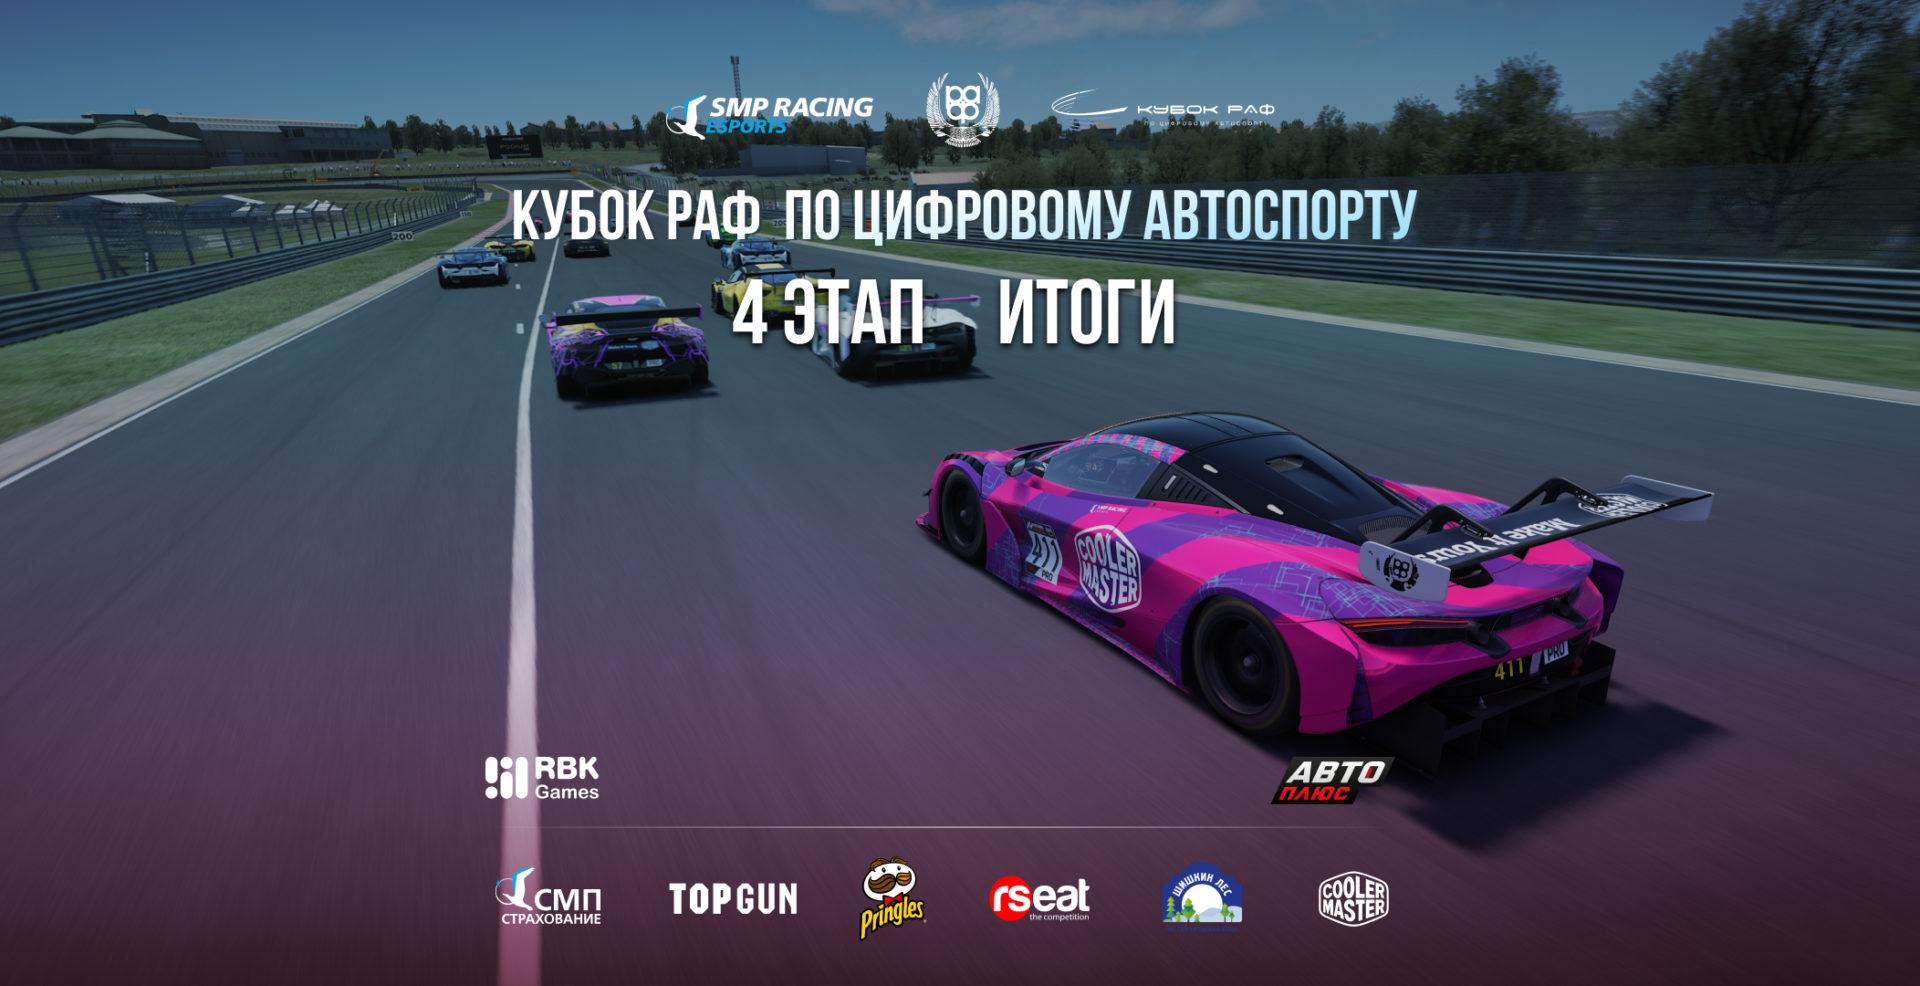 Итоги четвертого этапа Кубка РАФ по цифровому автоспорту